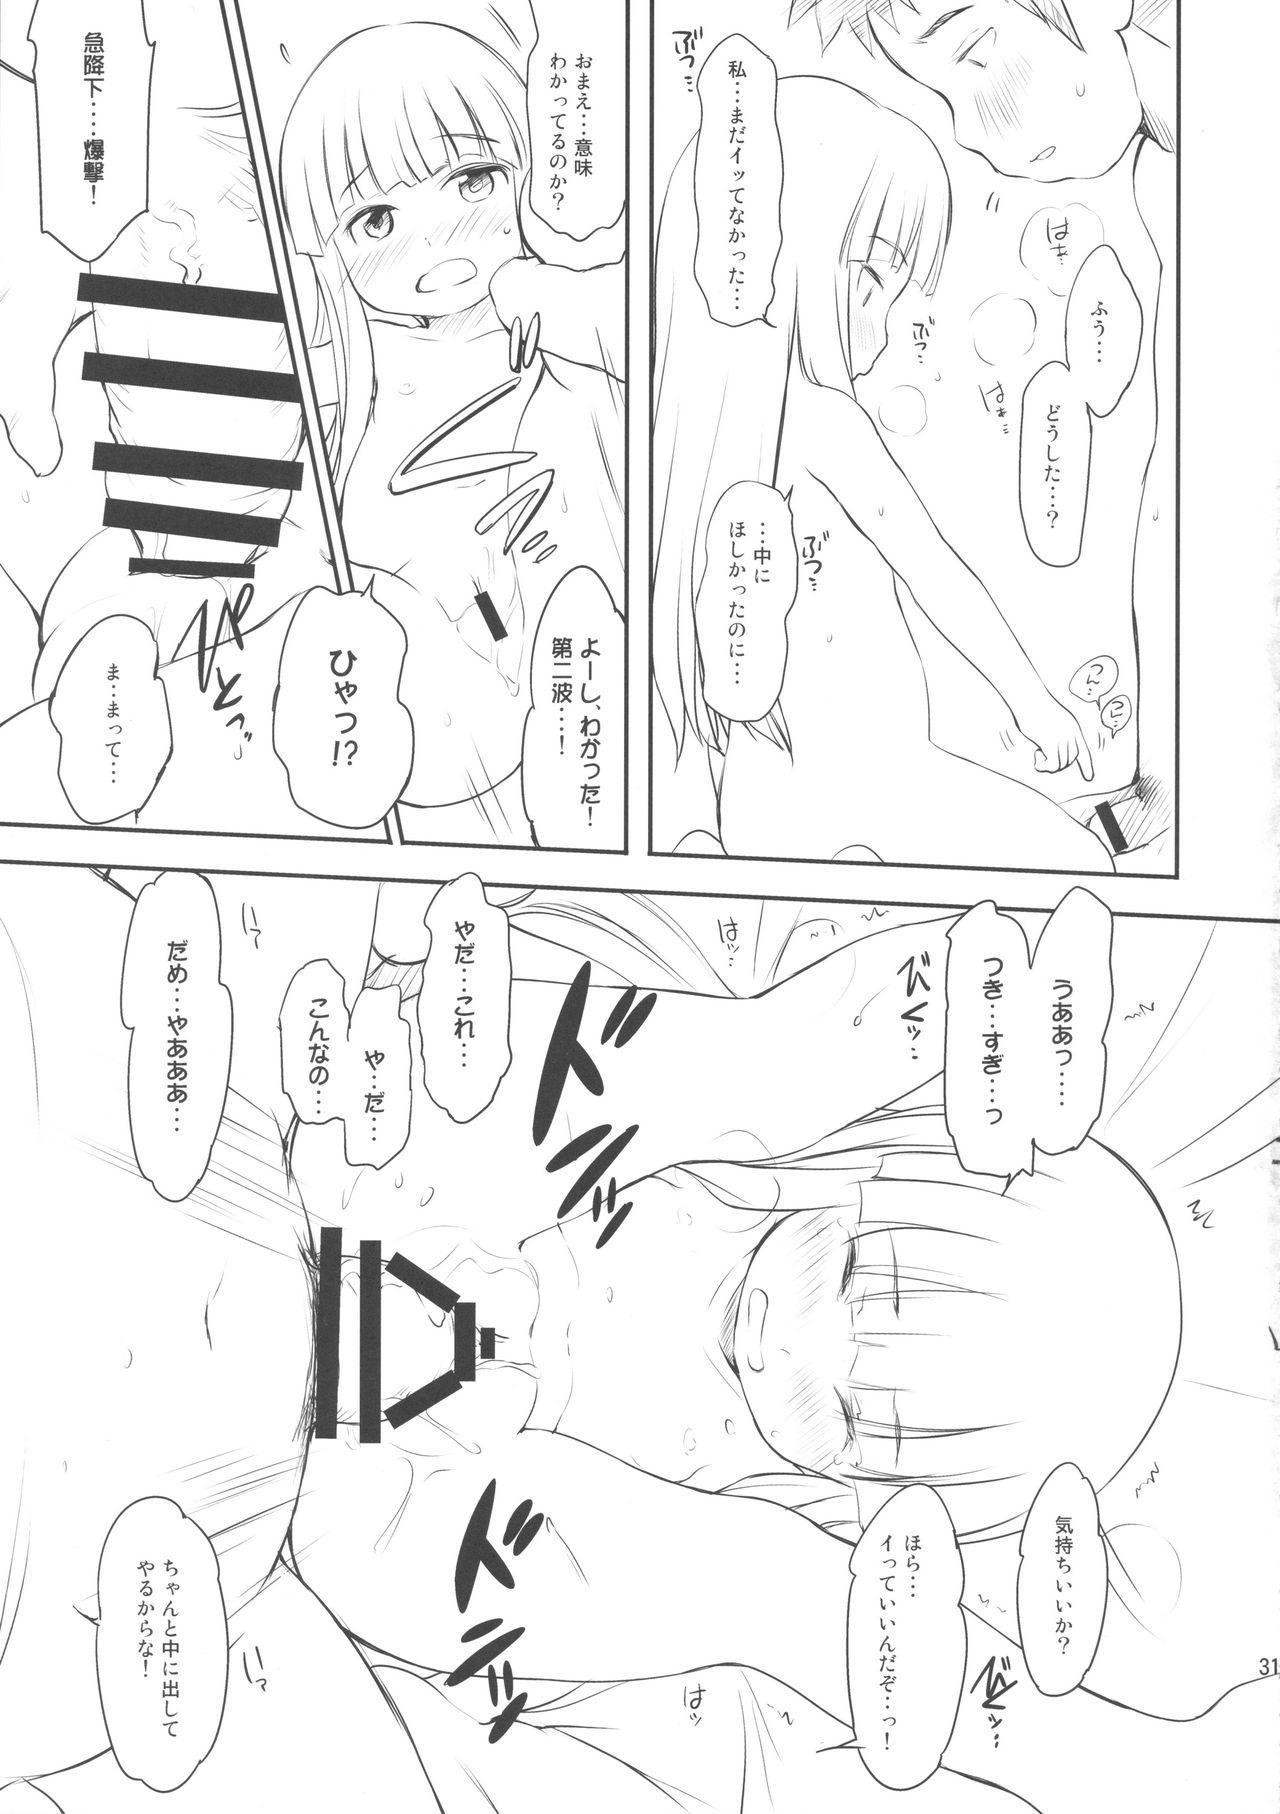 Kuchukukan Hachuyuki Monogatari 30